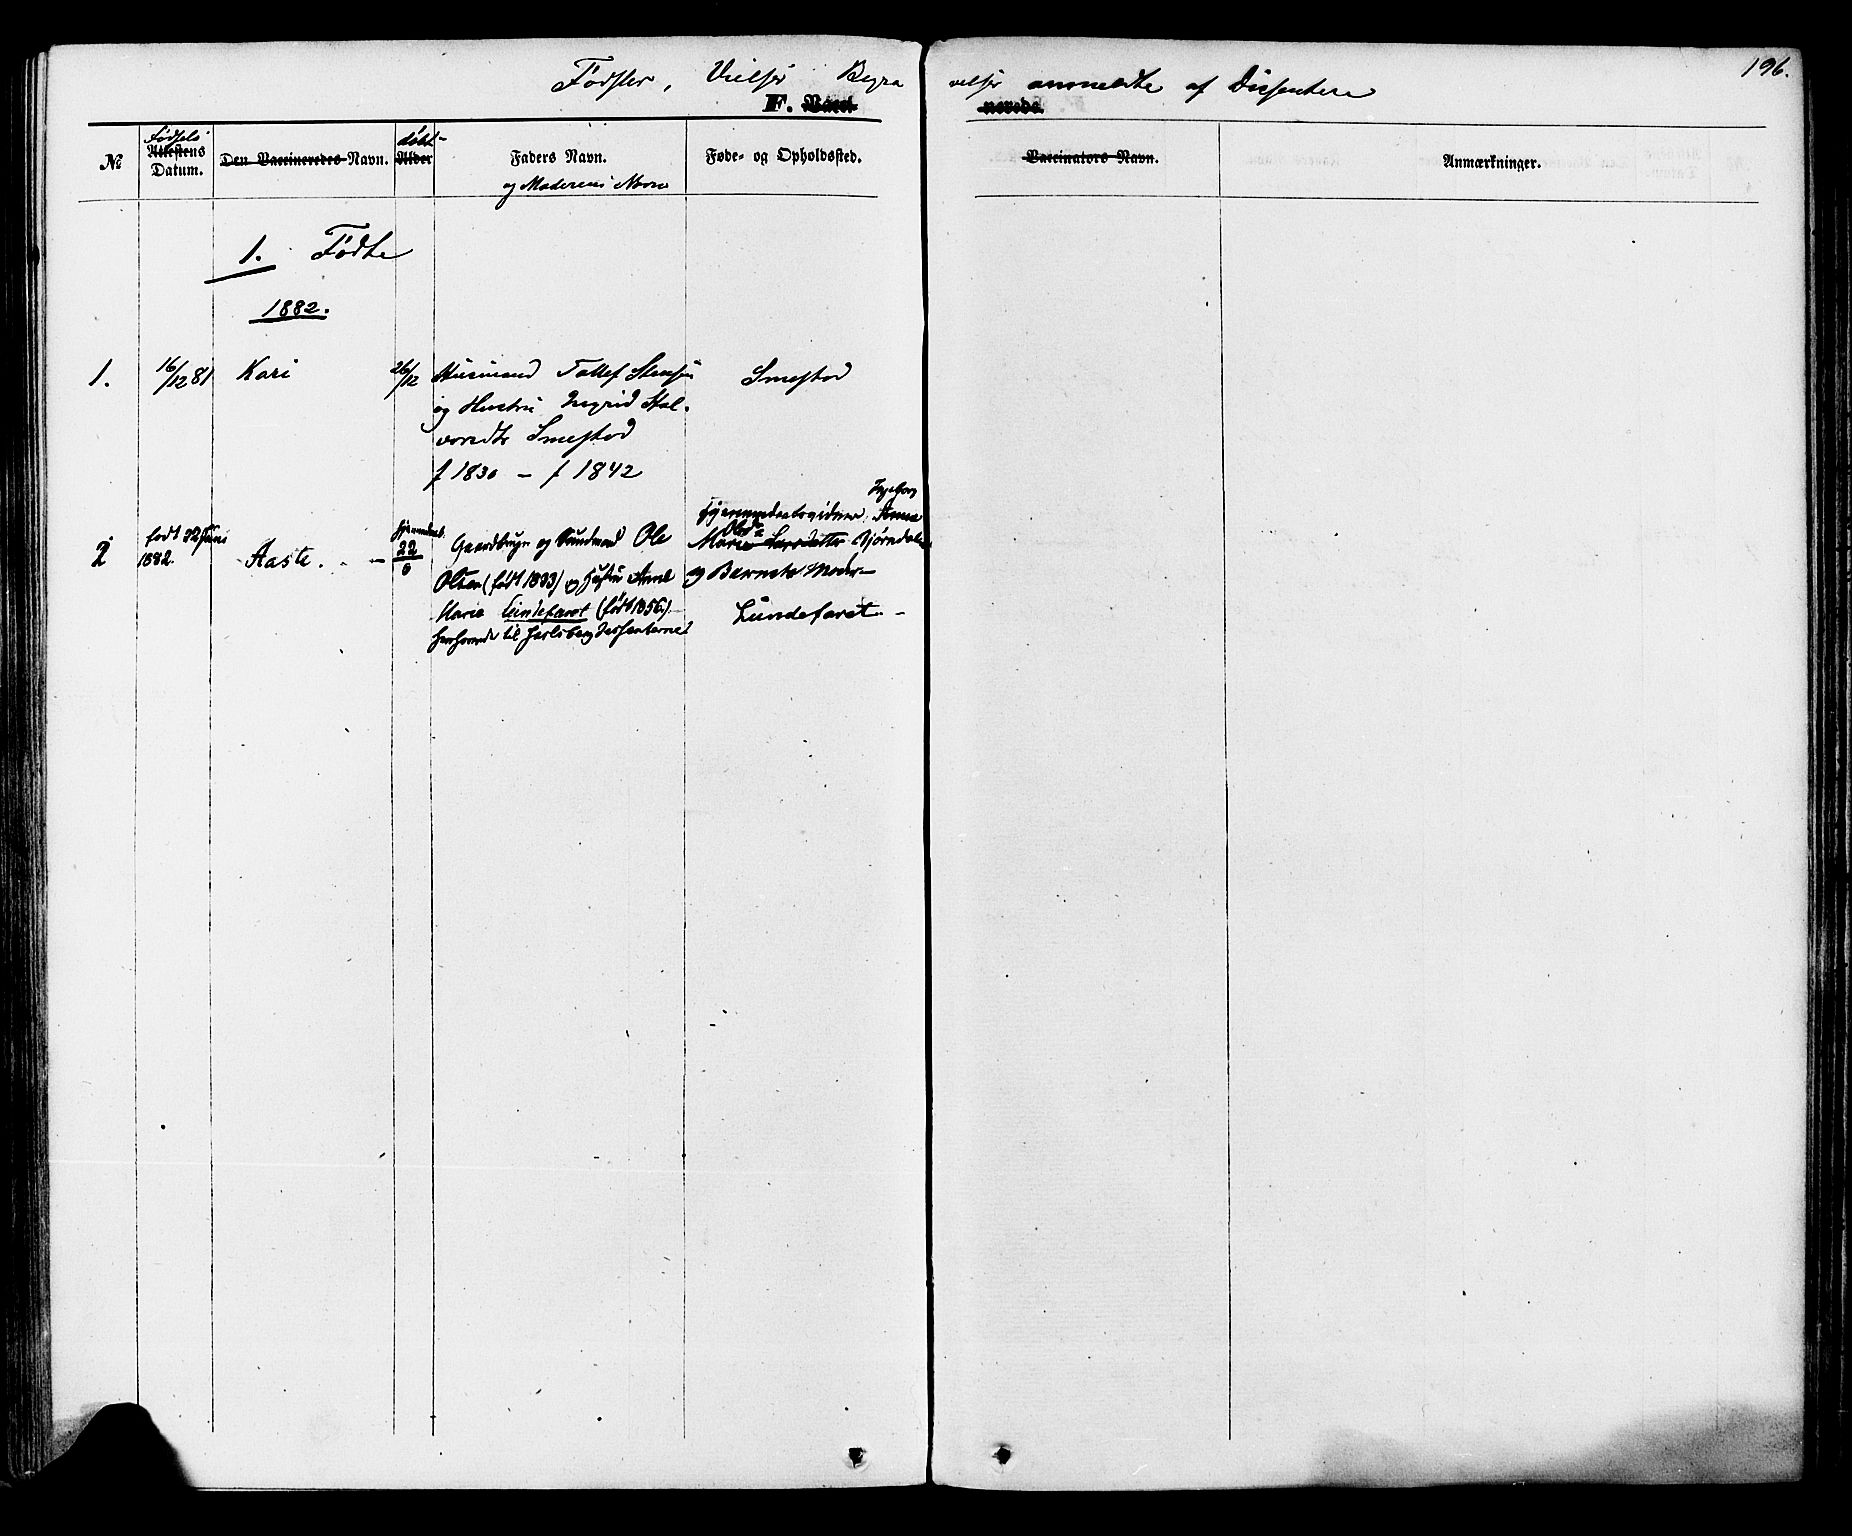 SAKO, Lunde kirkebøker, F/Fa/L0001: Ministerialbok nr. I 1, 1866-1883, s. 196